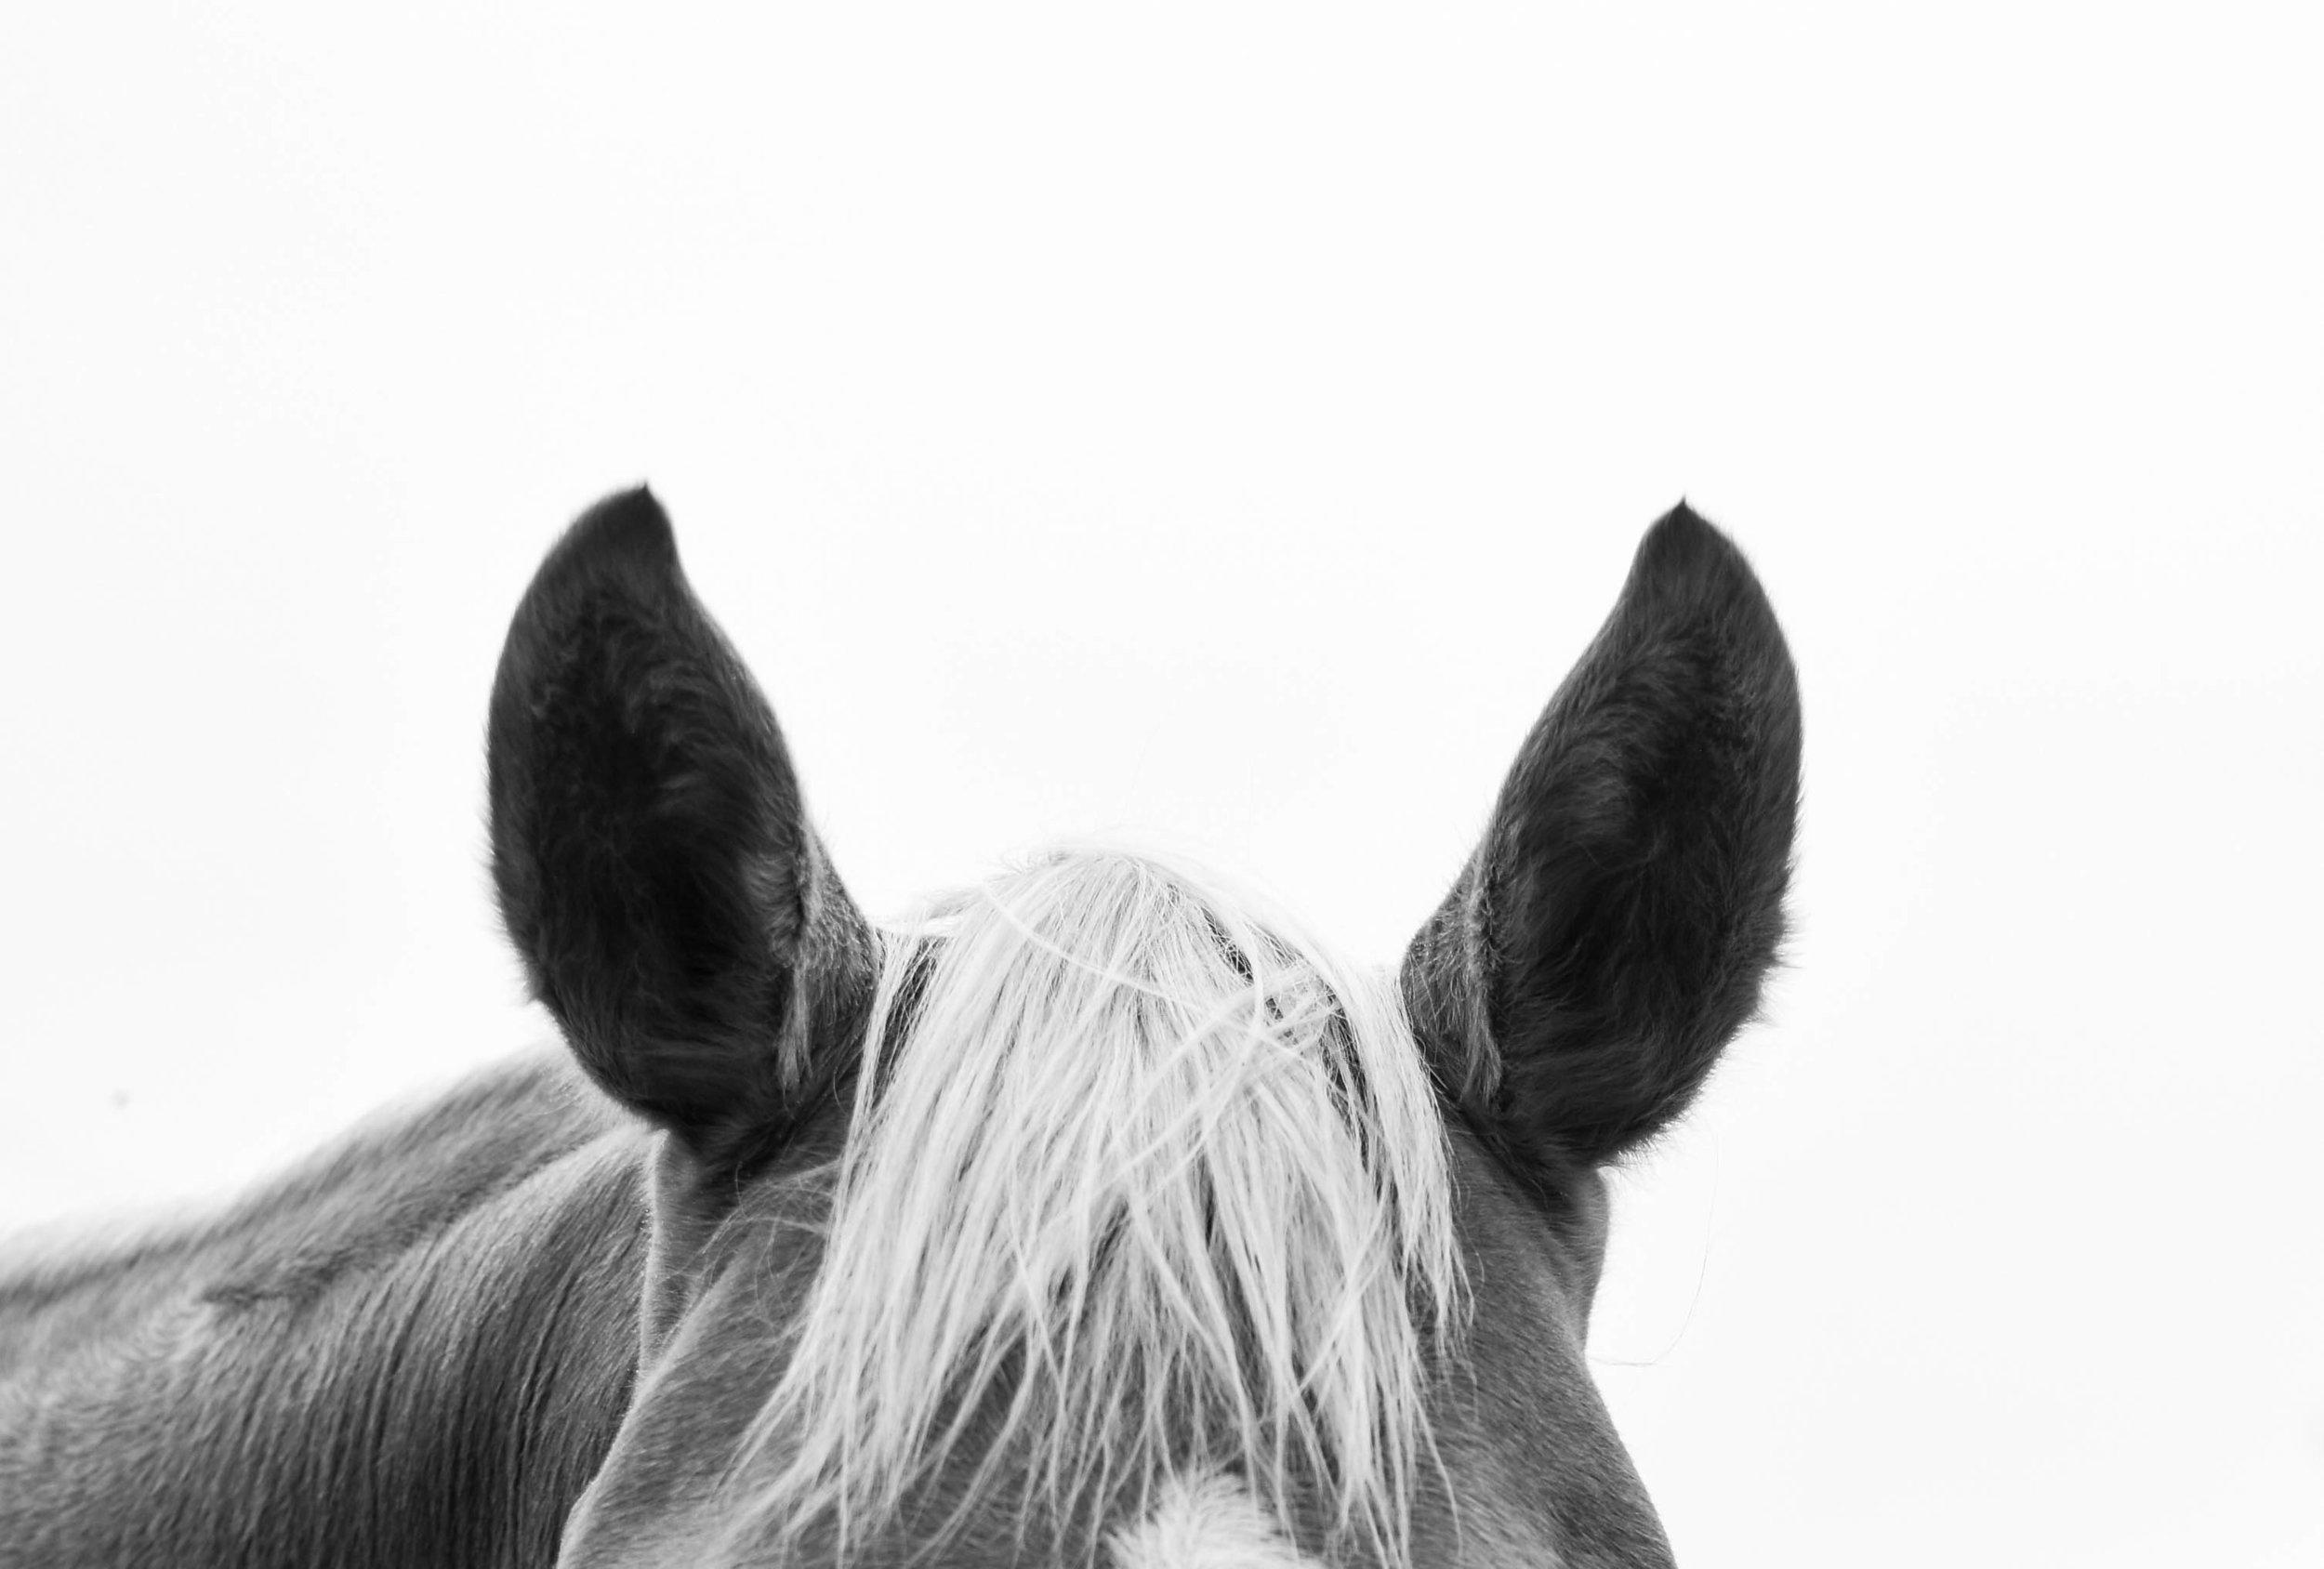 Horsemanship Audio - Listen to your favourite Horsemanship ArticlesNarrated by Sarah Jane Rose